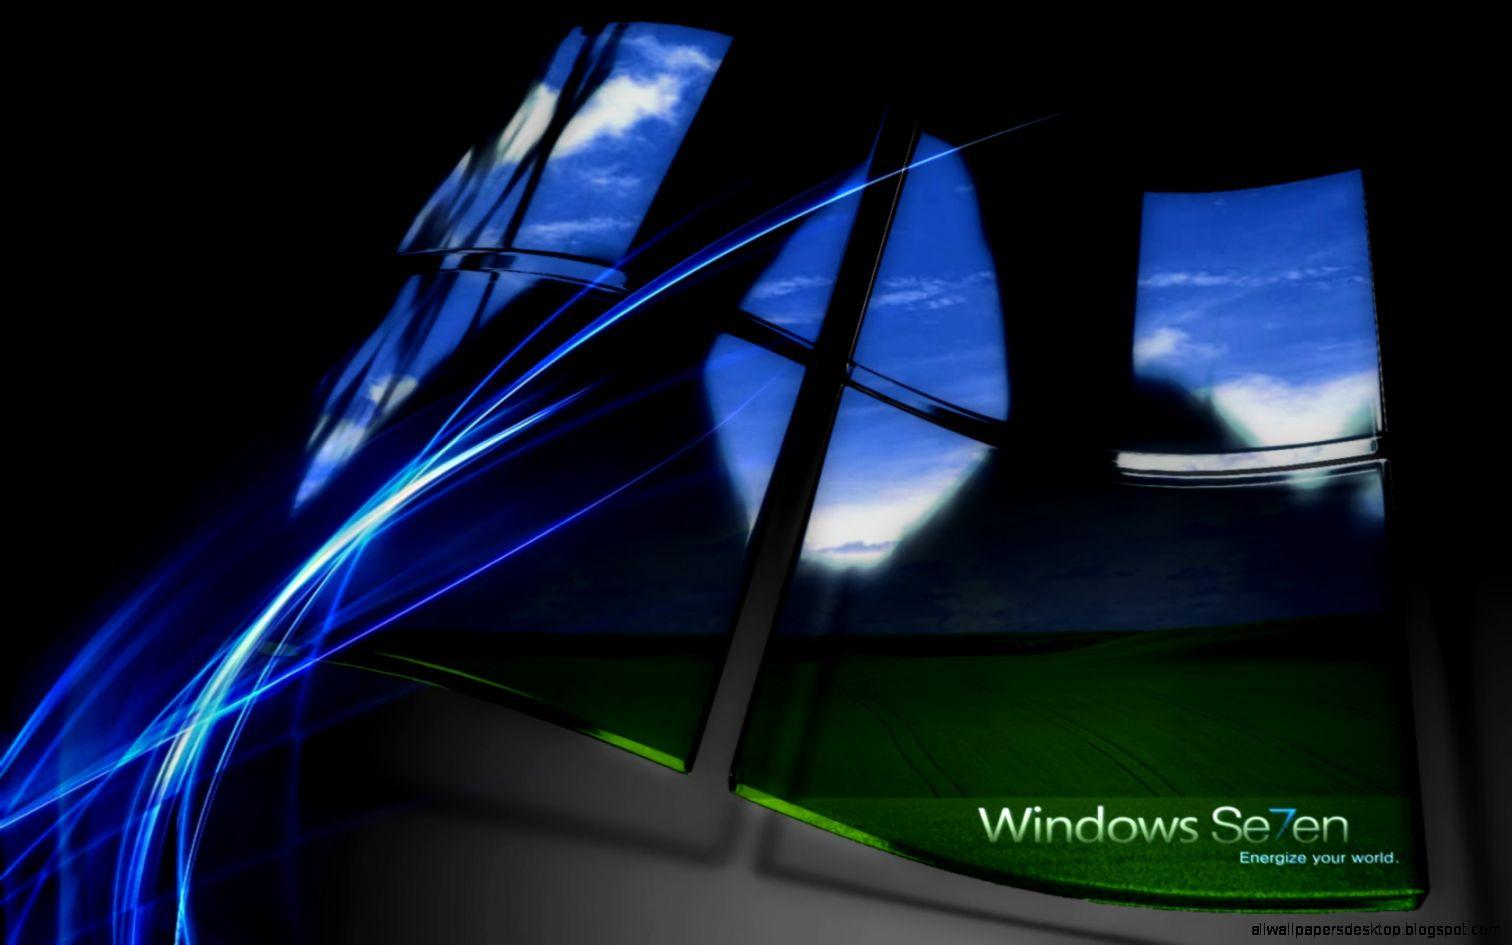 windows 7 ultimate wallpaper background desktop | all wallpapers desktop